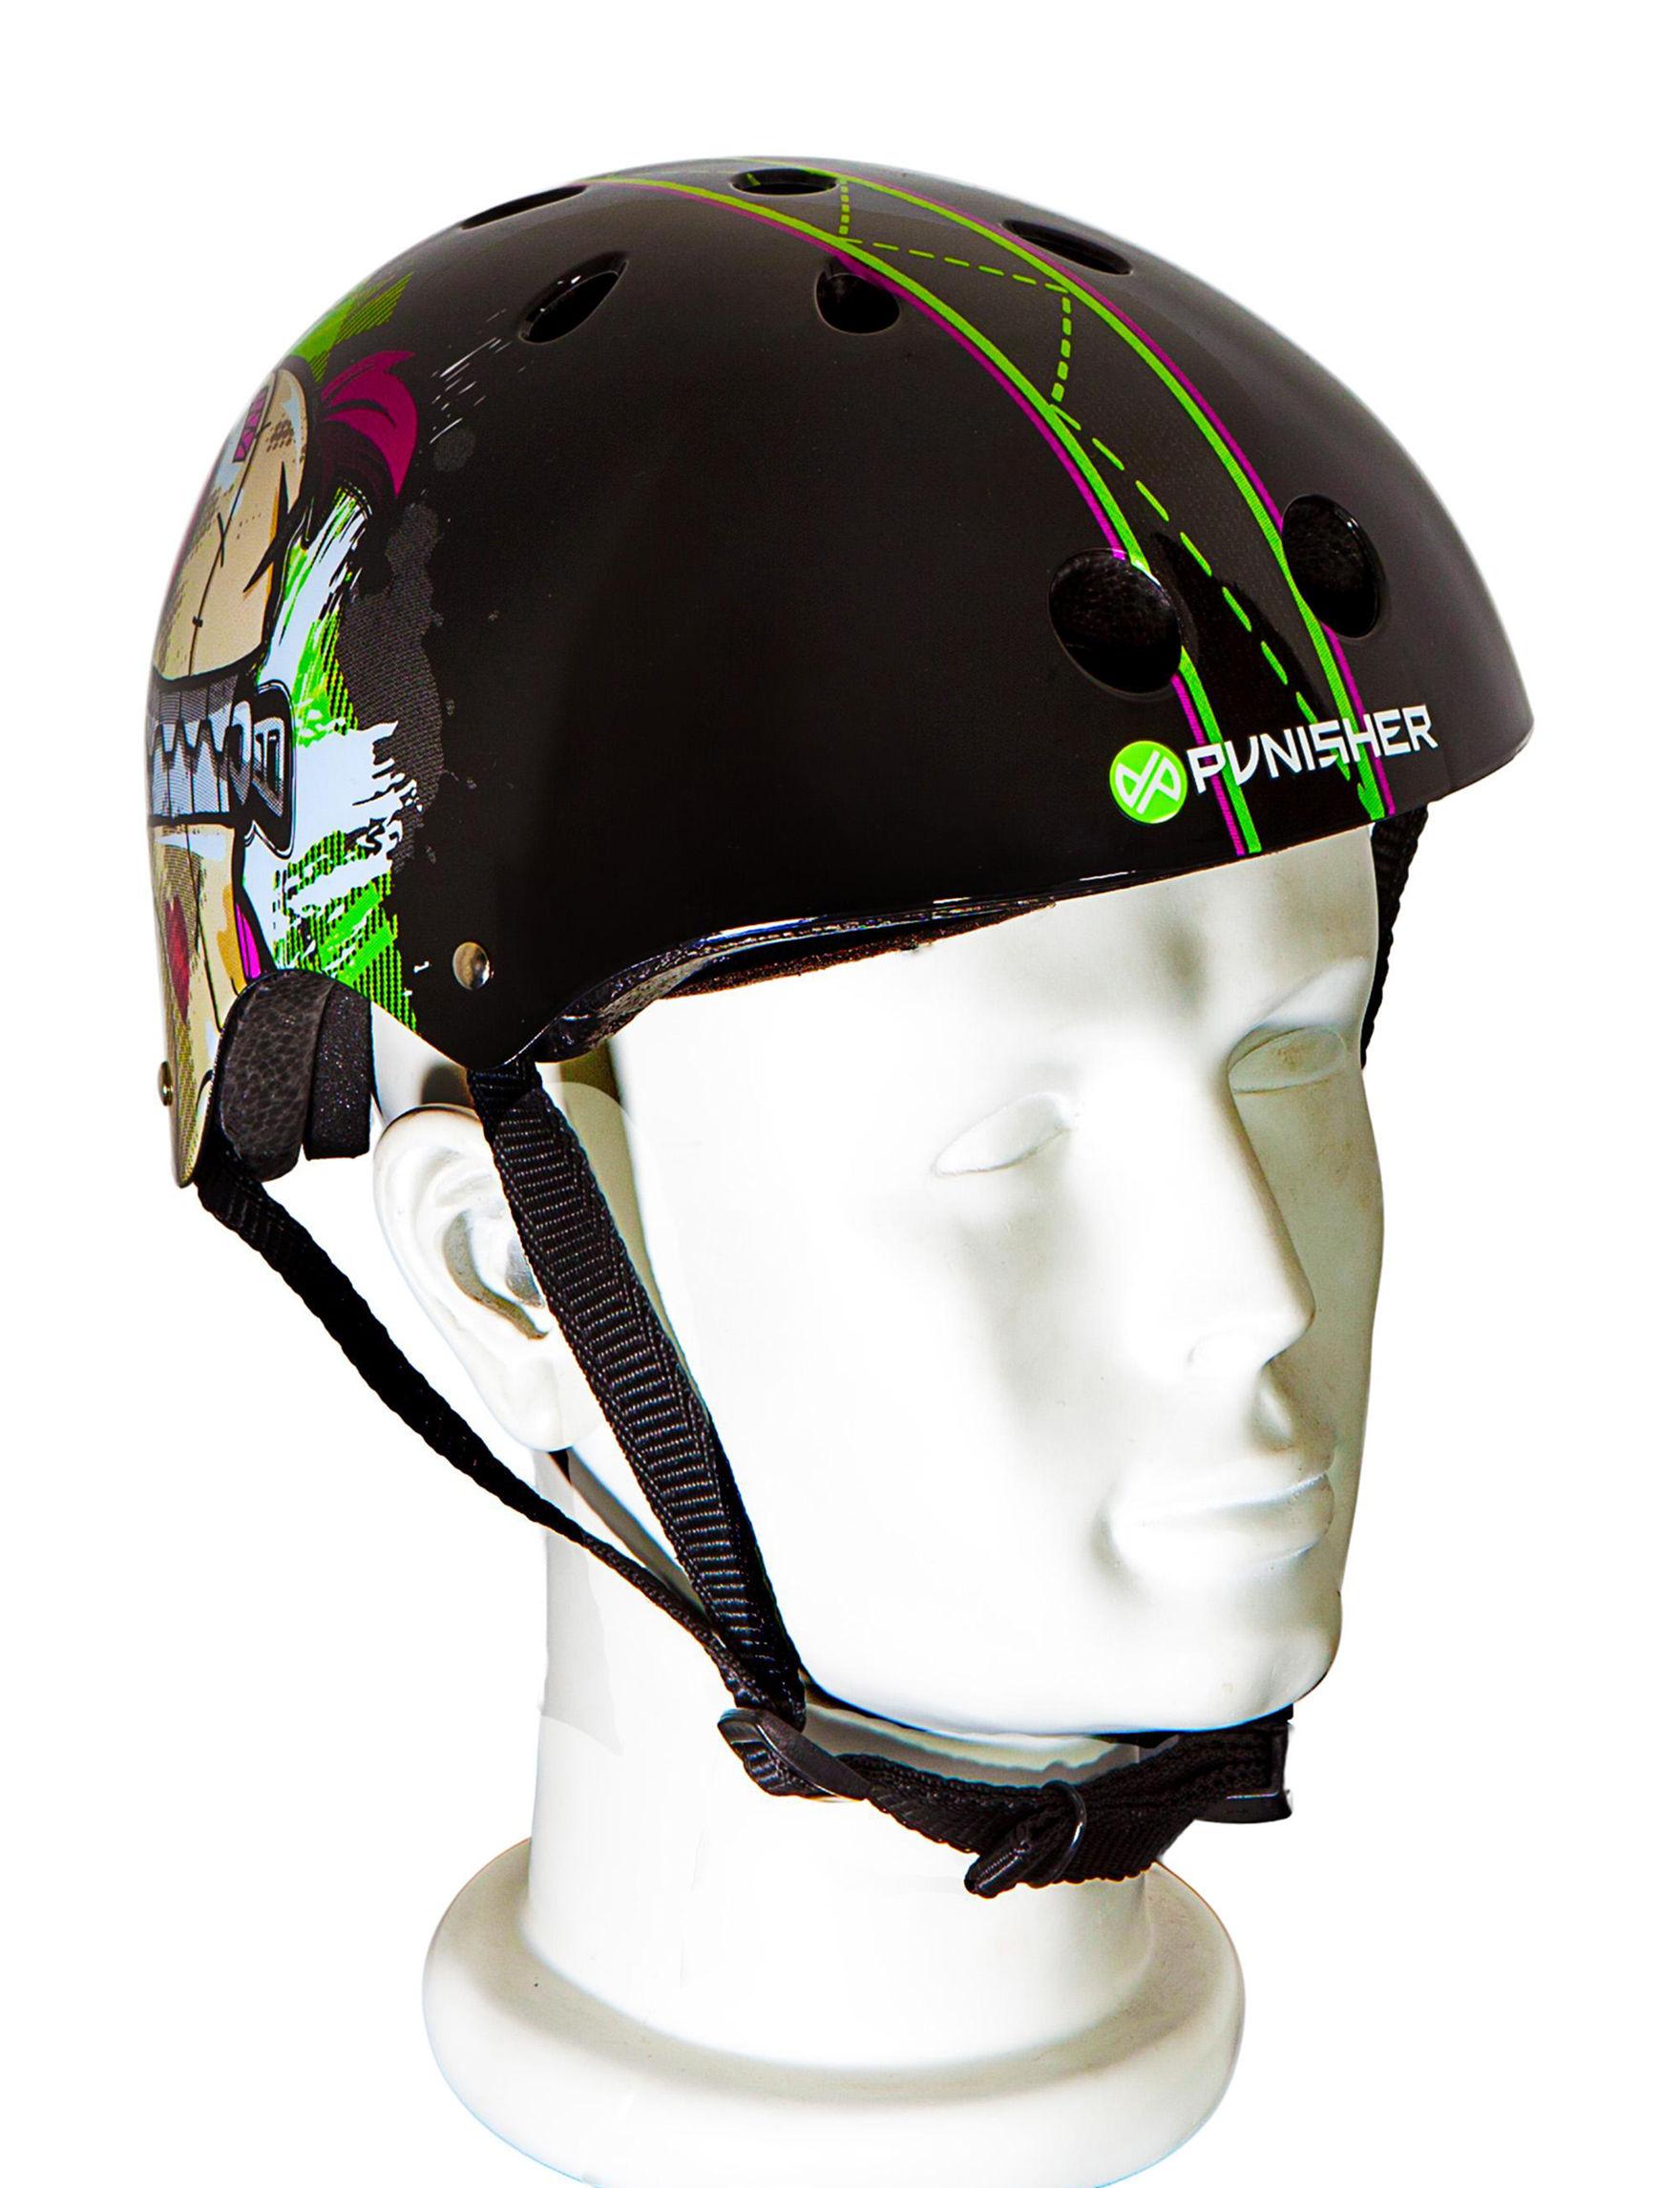 Punisher Skateboards Black / Green